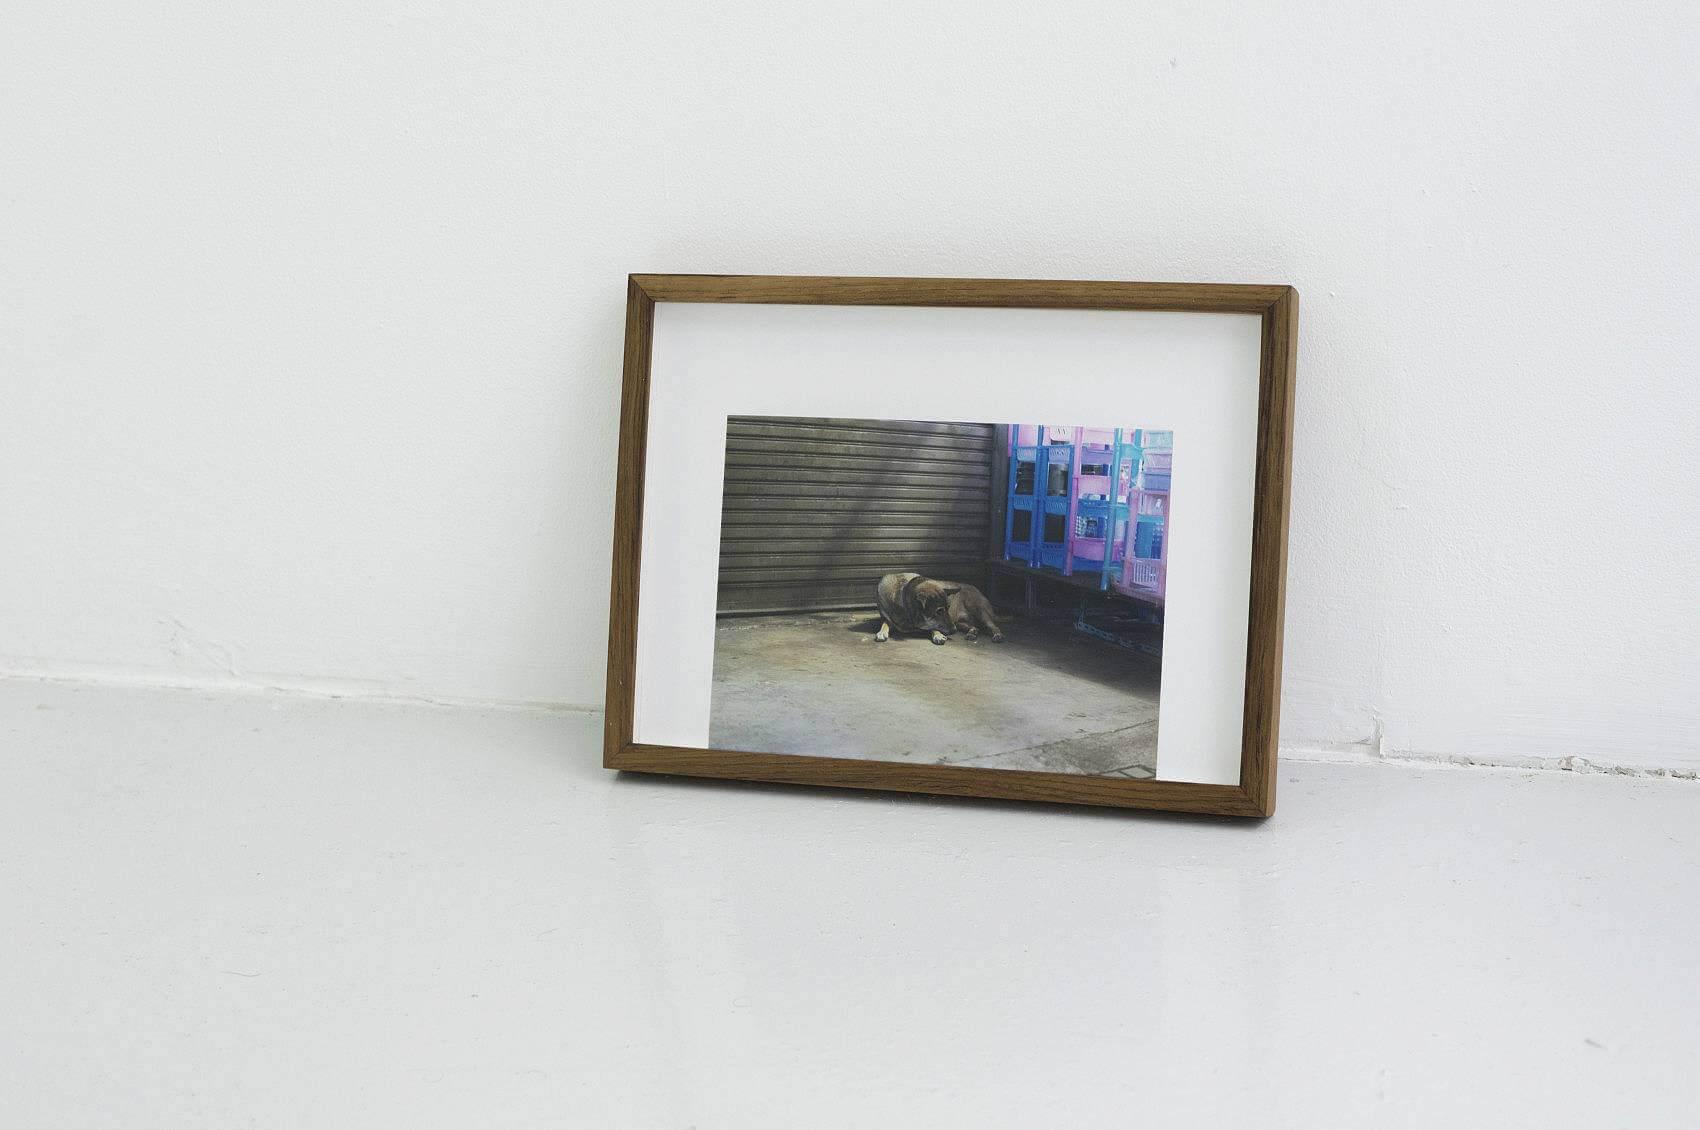 Easy Riders, series of 3 lambda prints, deep box frame, 30 x 22 cm, 2016